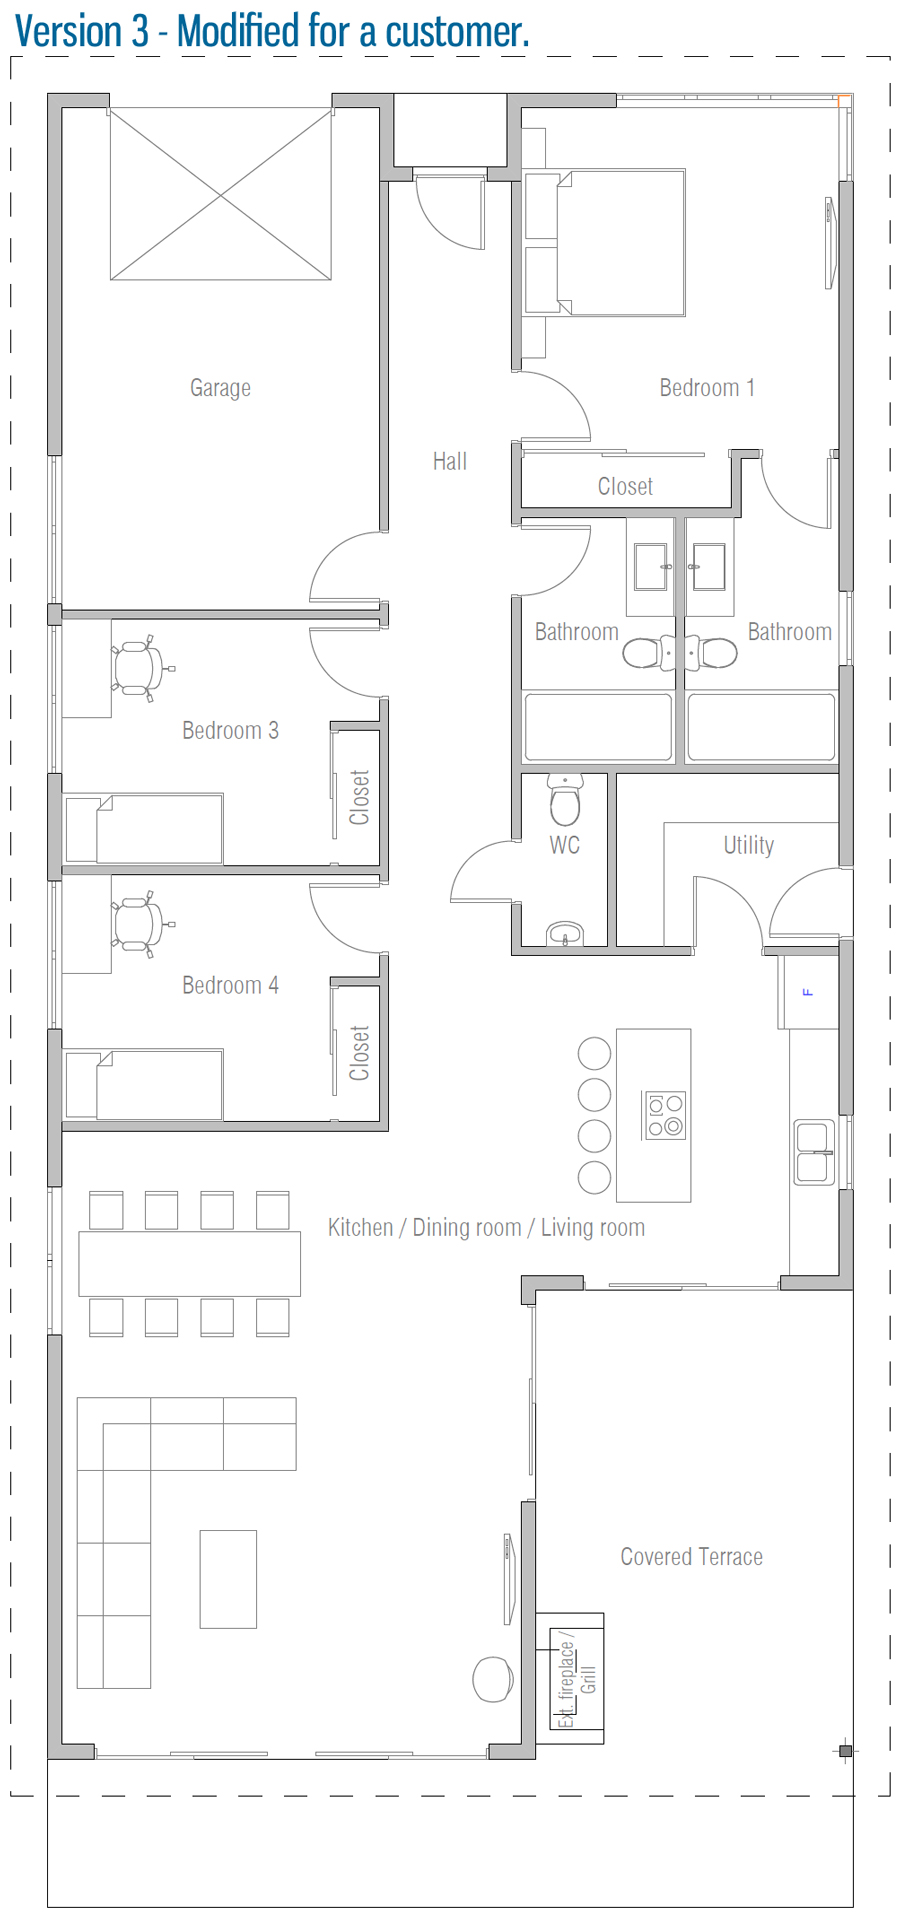 affordable-homes_35_home_plan_CH535_V3_CH524_V3.jpg